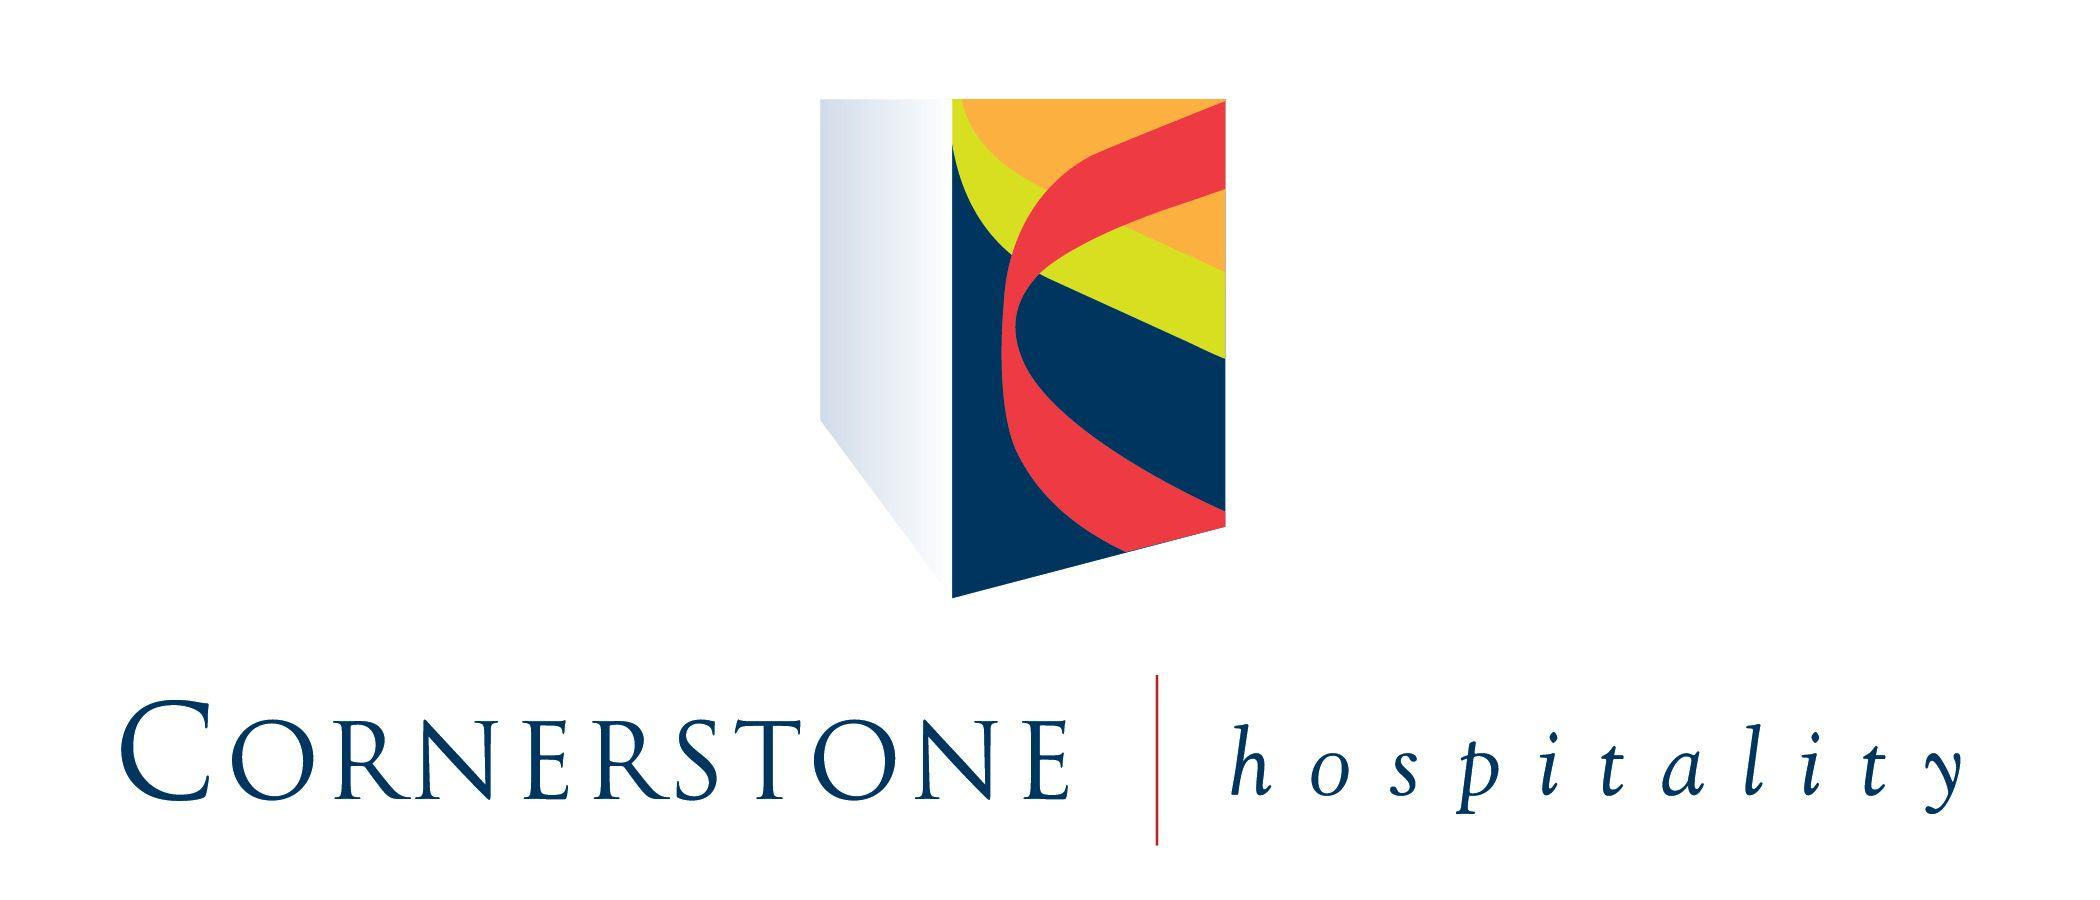 cornerstonehospitaly Logo